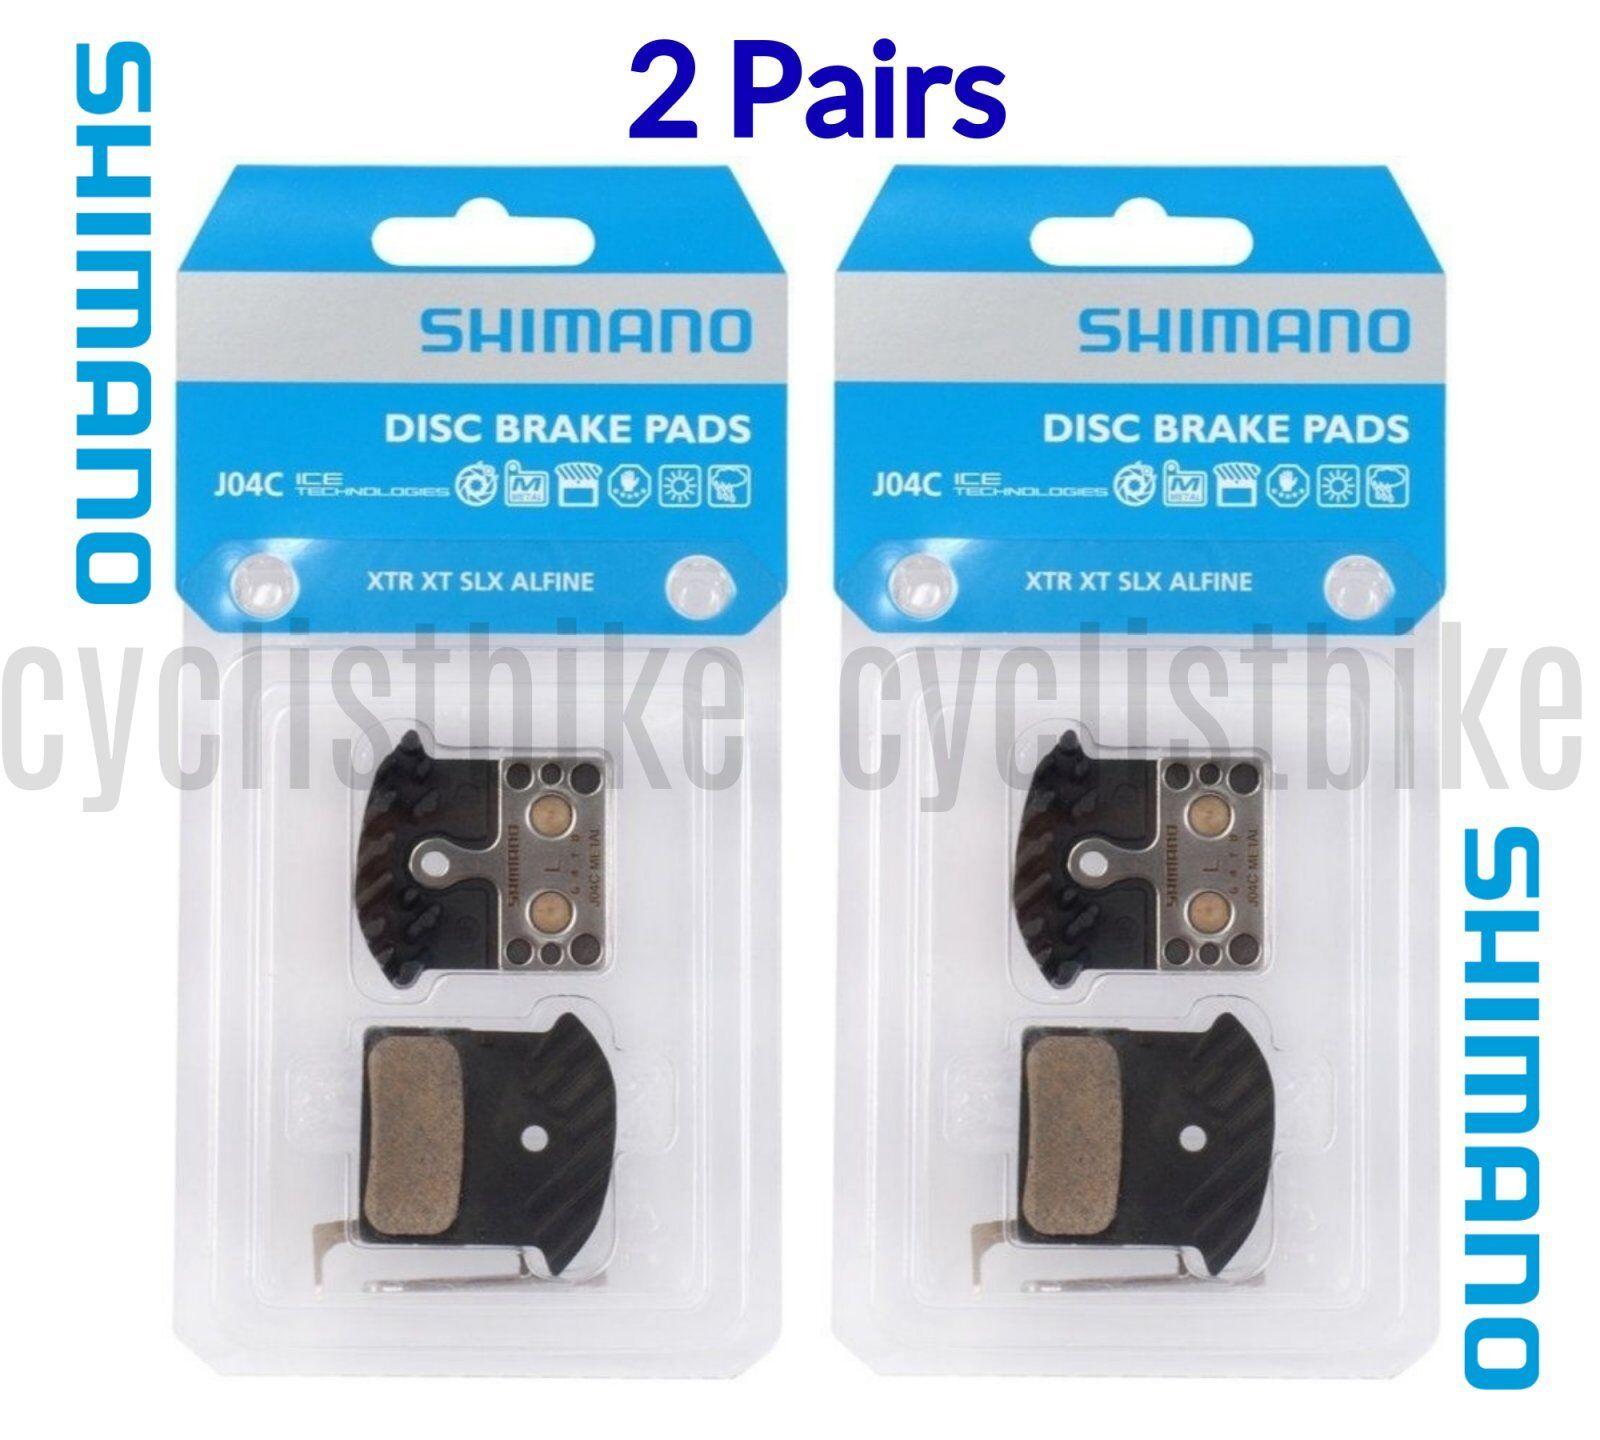 (2 Pairs) Shimano J04C  Metal Disc Pads for XTR XT SLX w Cooling Fin & Spring NIB  order now